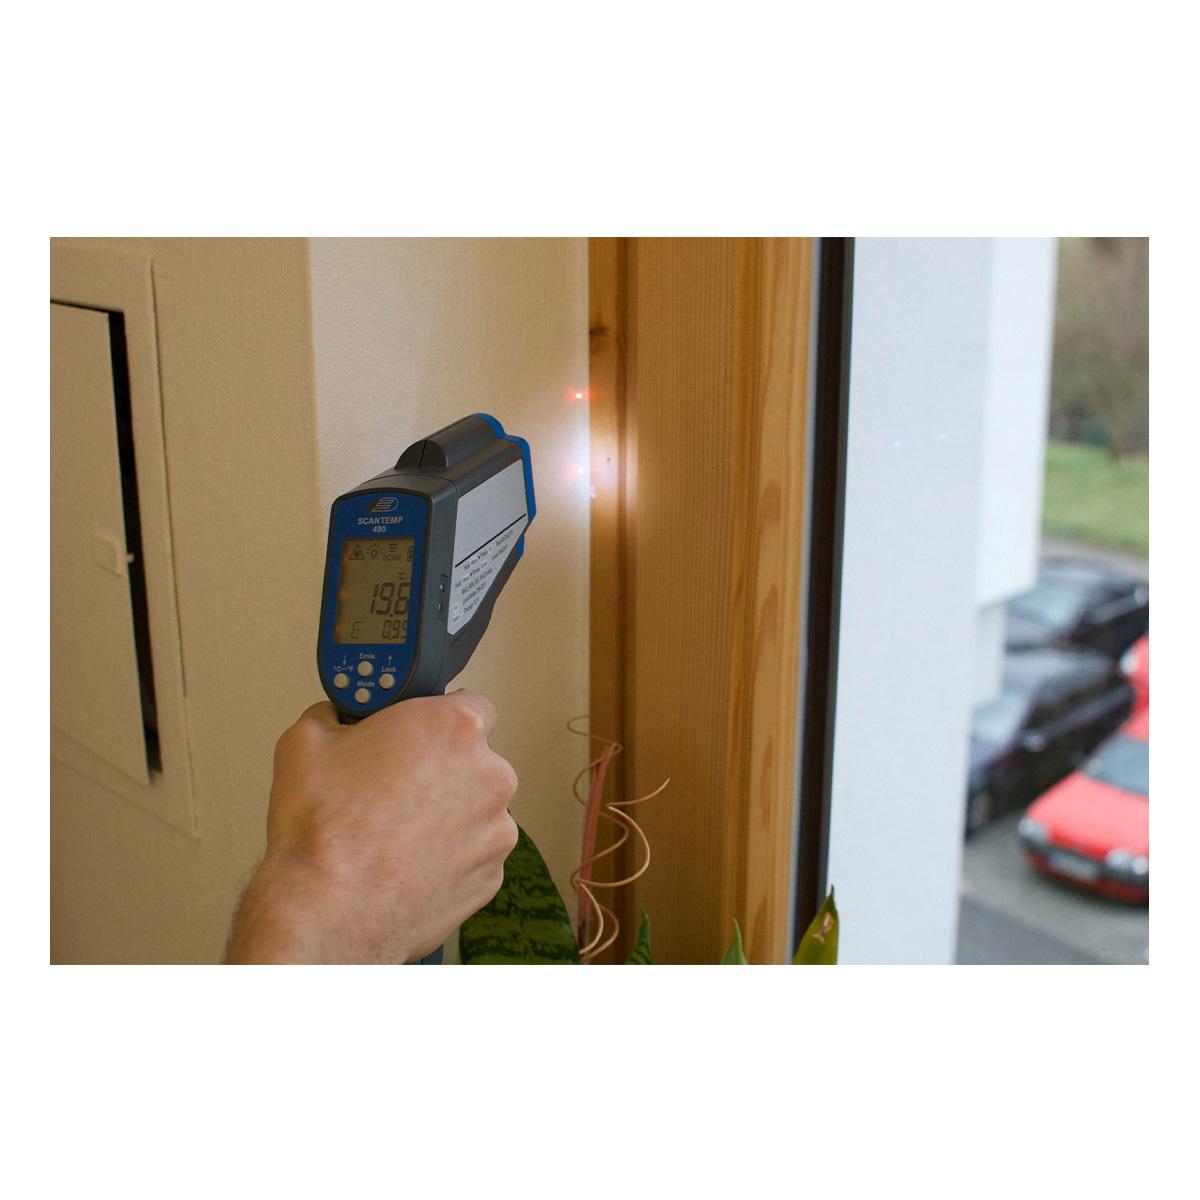 31-1123-k-infrarot-thermometer-scantemp-490-anwendung1-1200x1200px.jpg